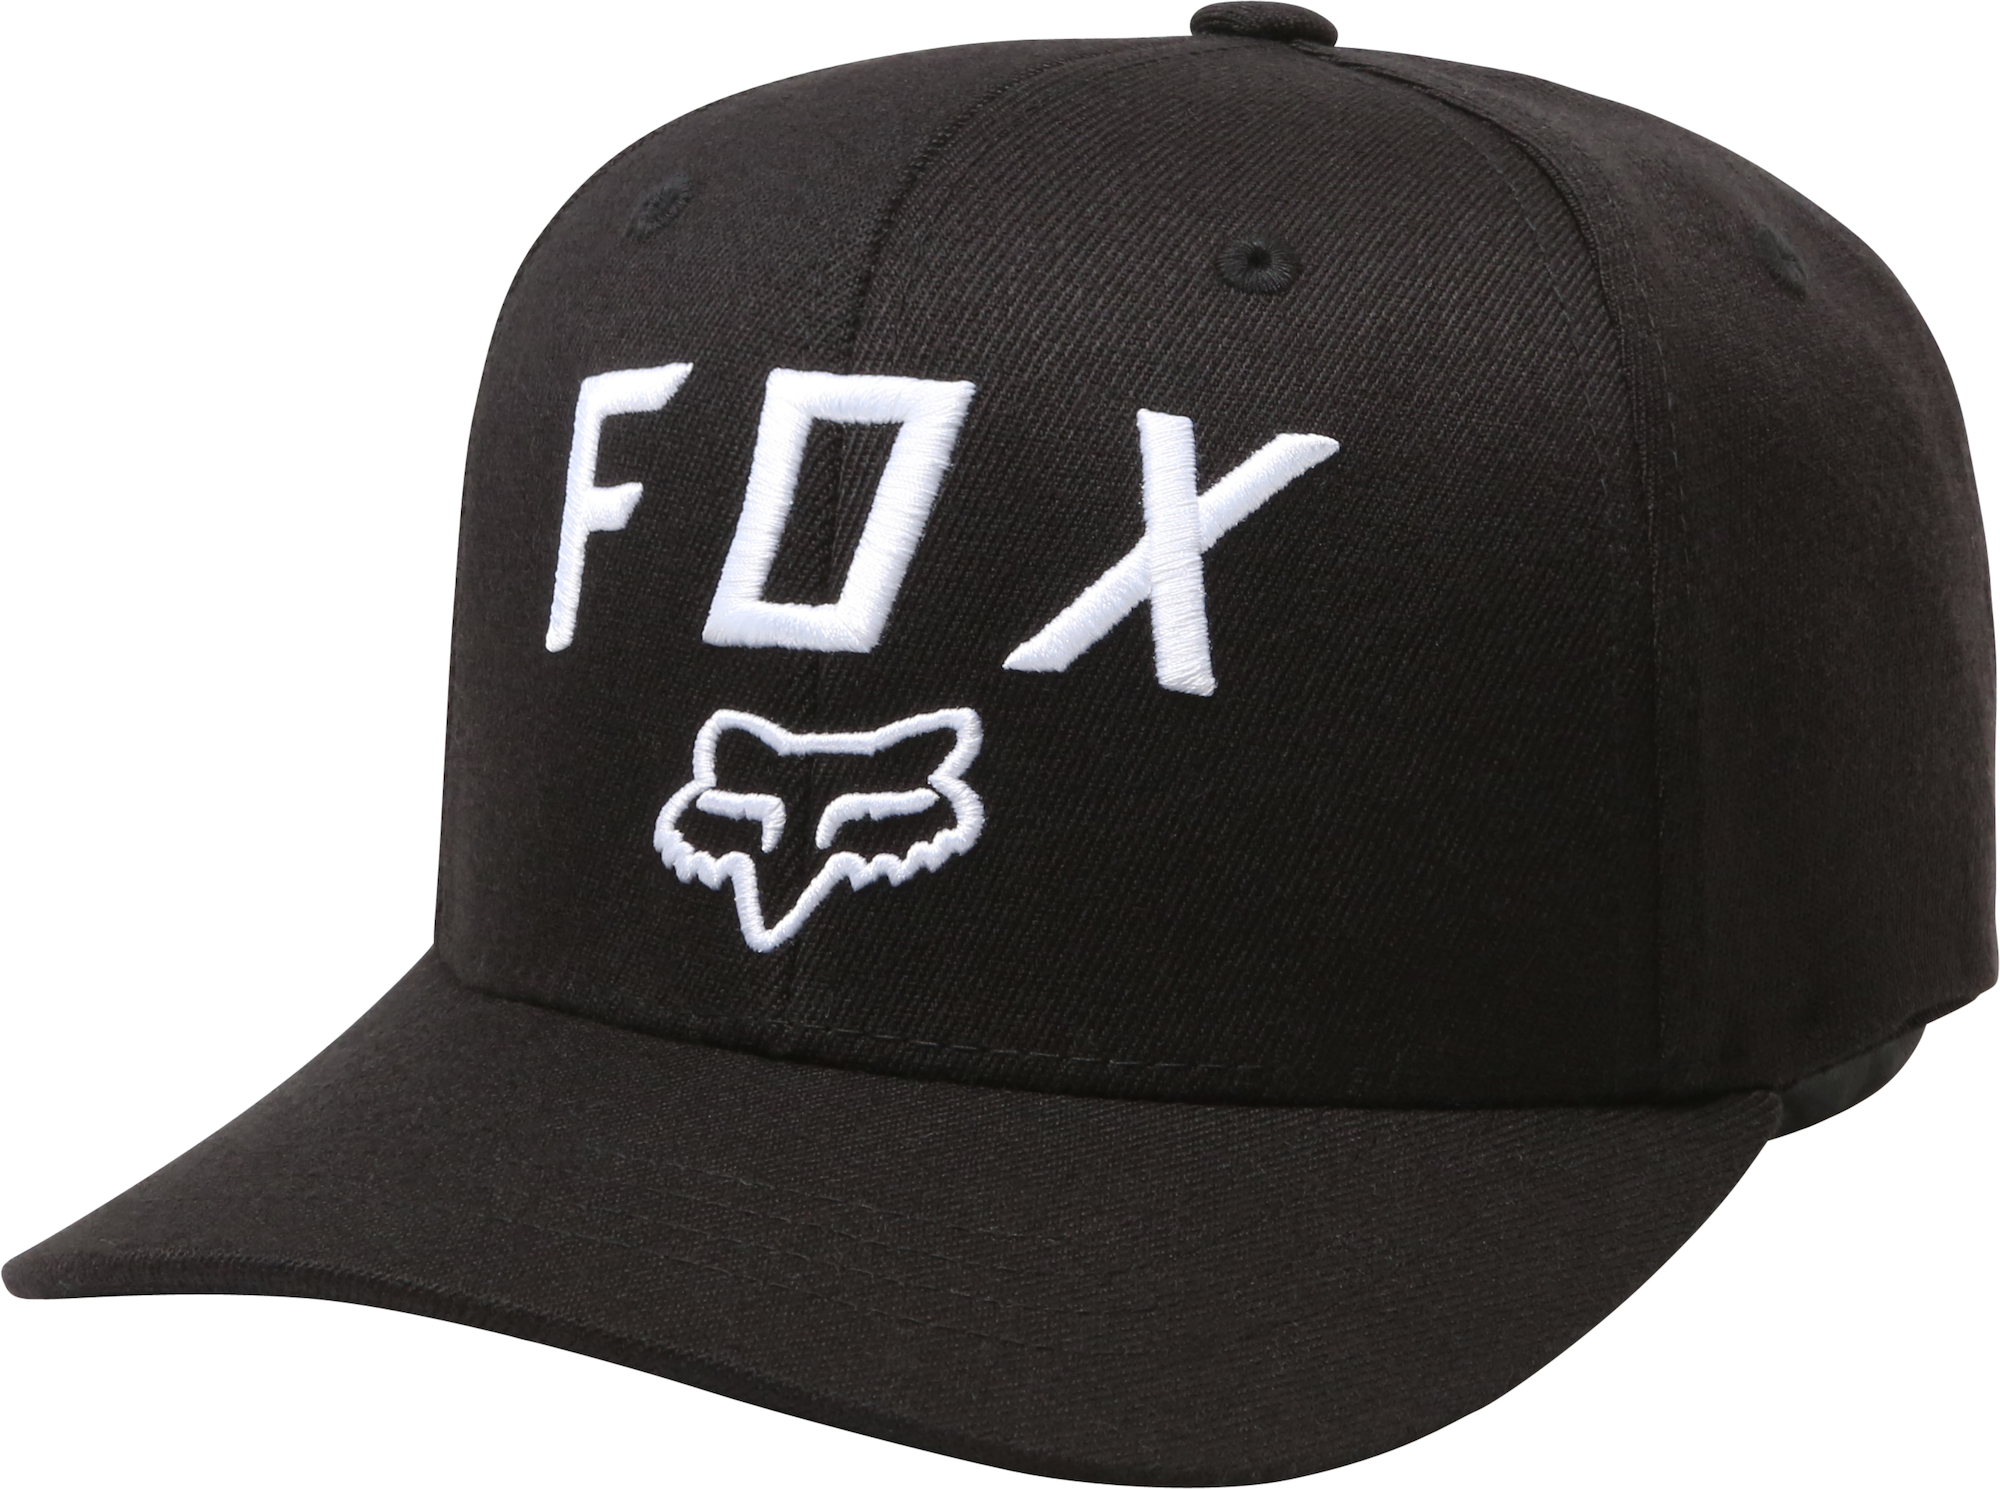 8338baa1d Sporting Goods > Cycling > Cycling Clothing > Hats, Caps & Headbands ...